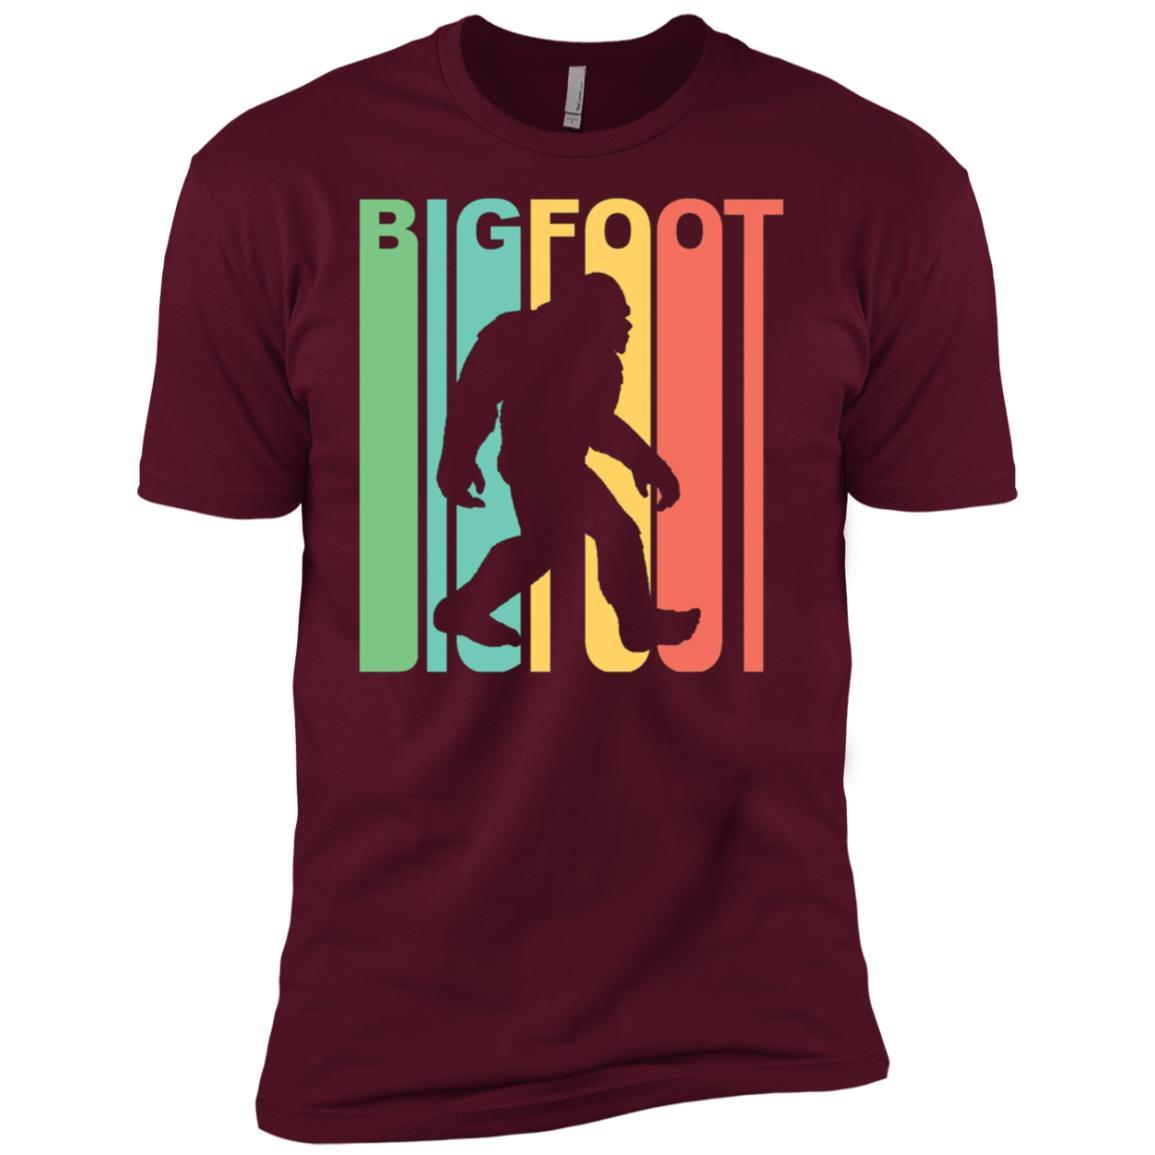 Vintage Retro 1970s Style Rainbow Bigfoot Silhouette Men Short Sleeve T-Shirt